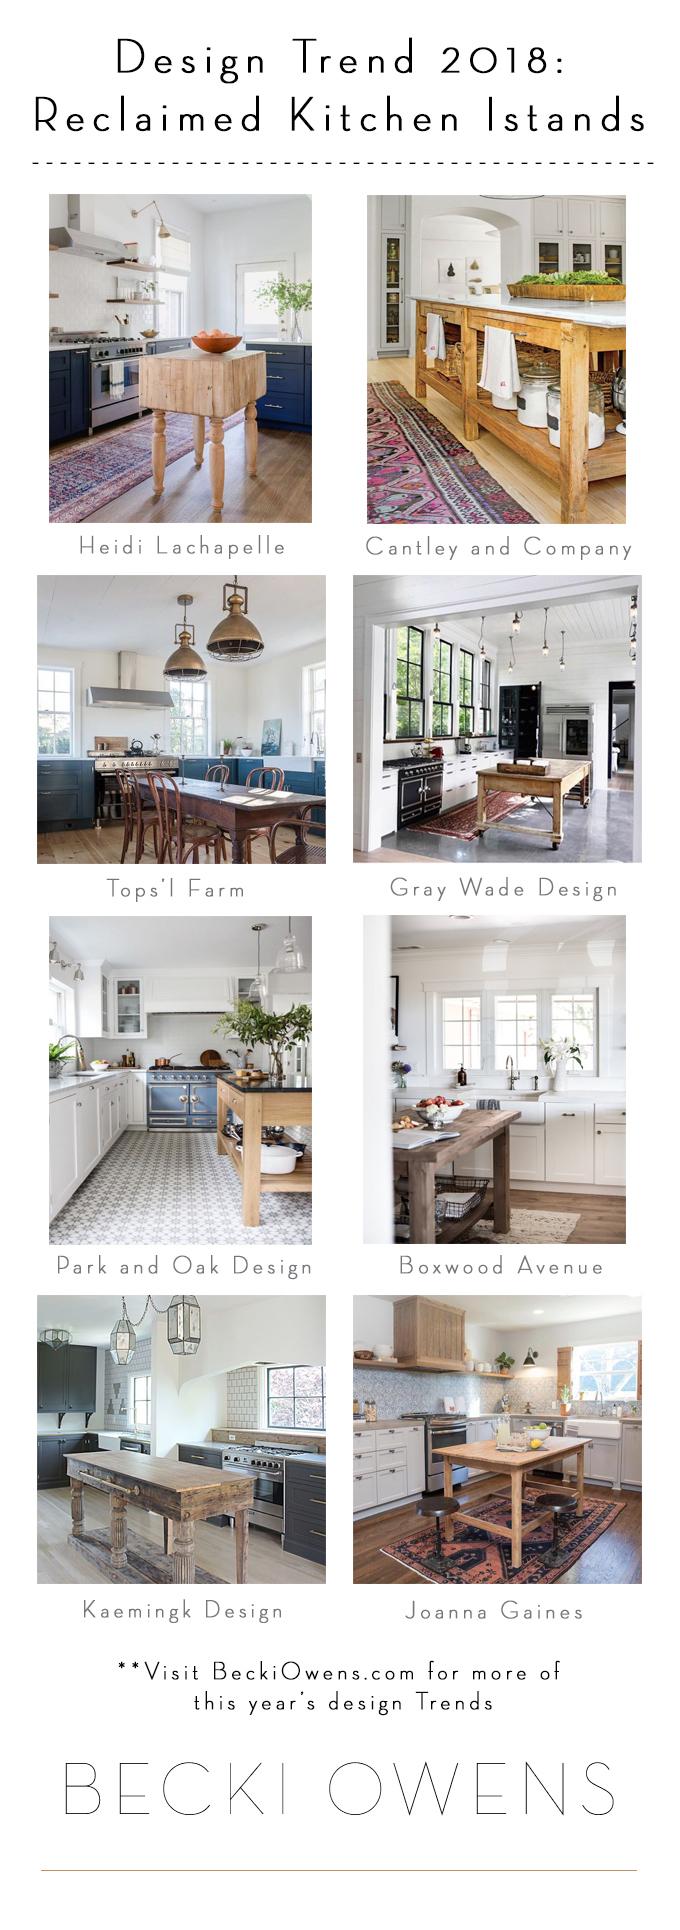 Design Trend 2018 Reclaimed Kitchen Islands Becki Owens